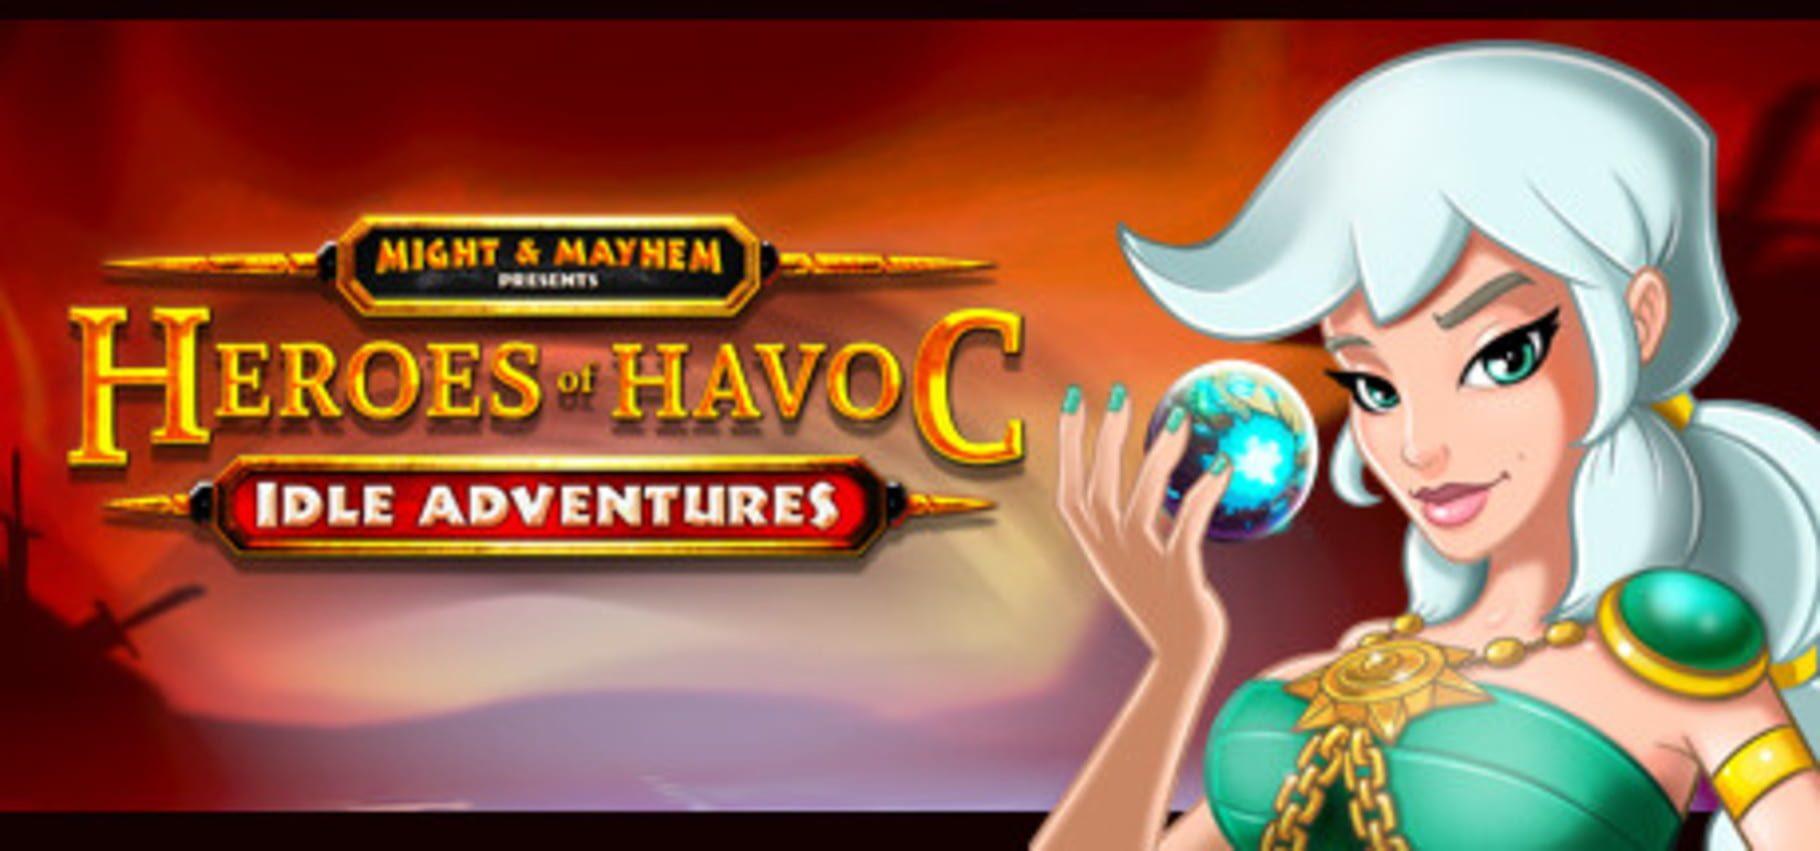 buy Heroes of Havoc: Idle Adventures cd key for all platform